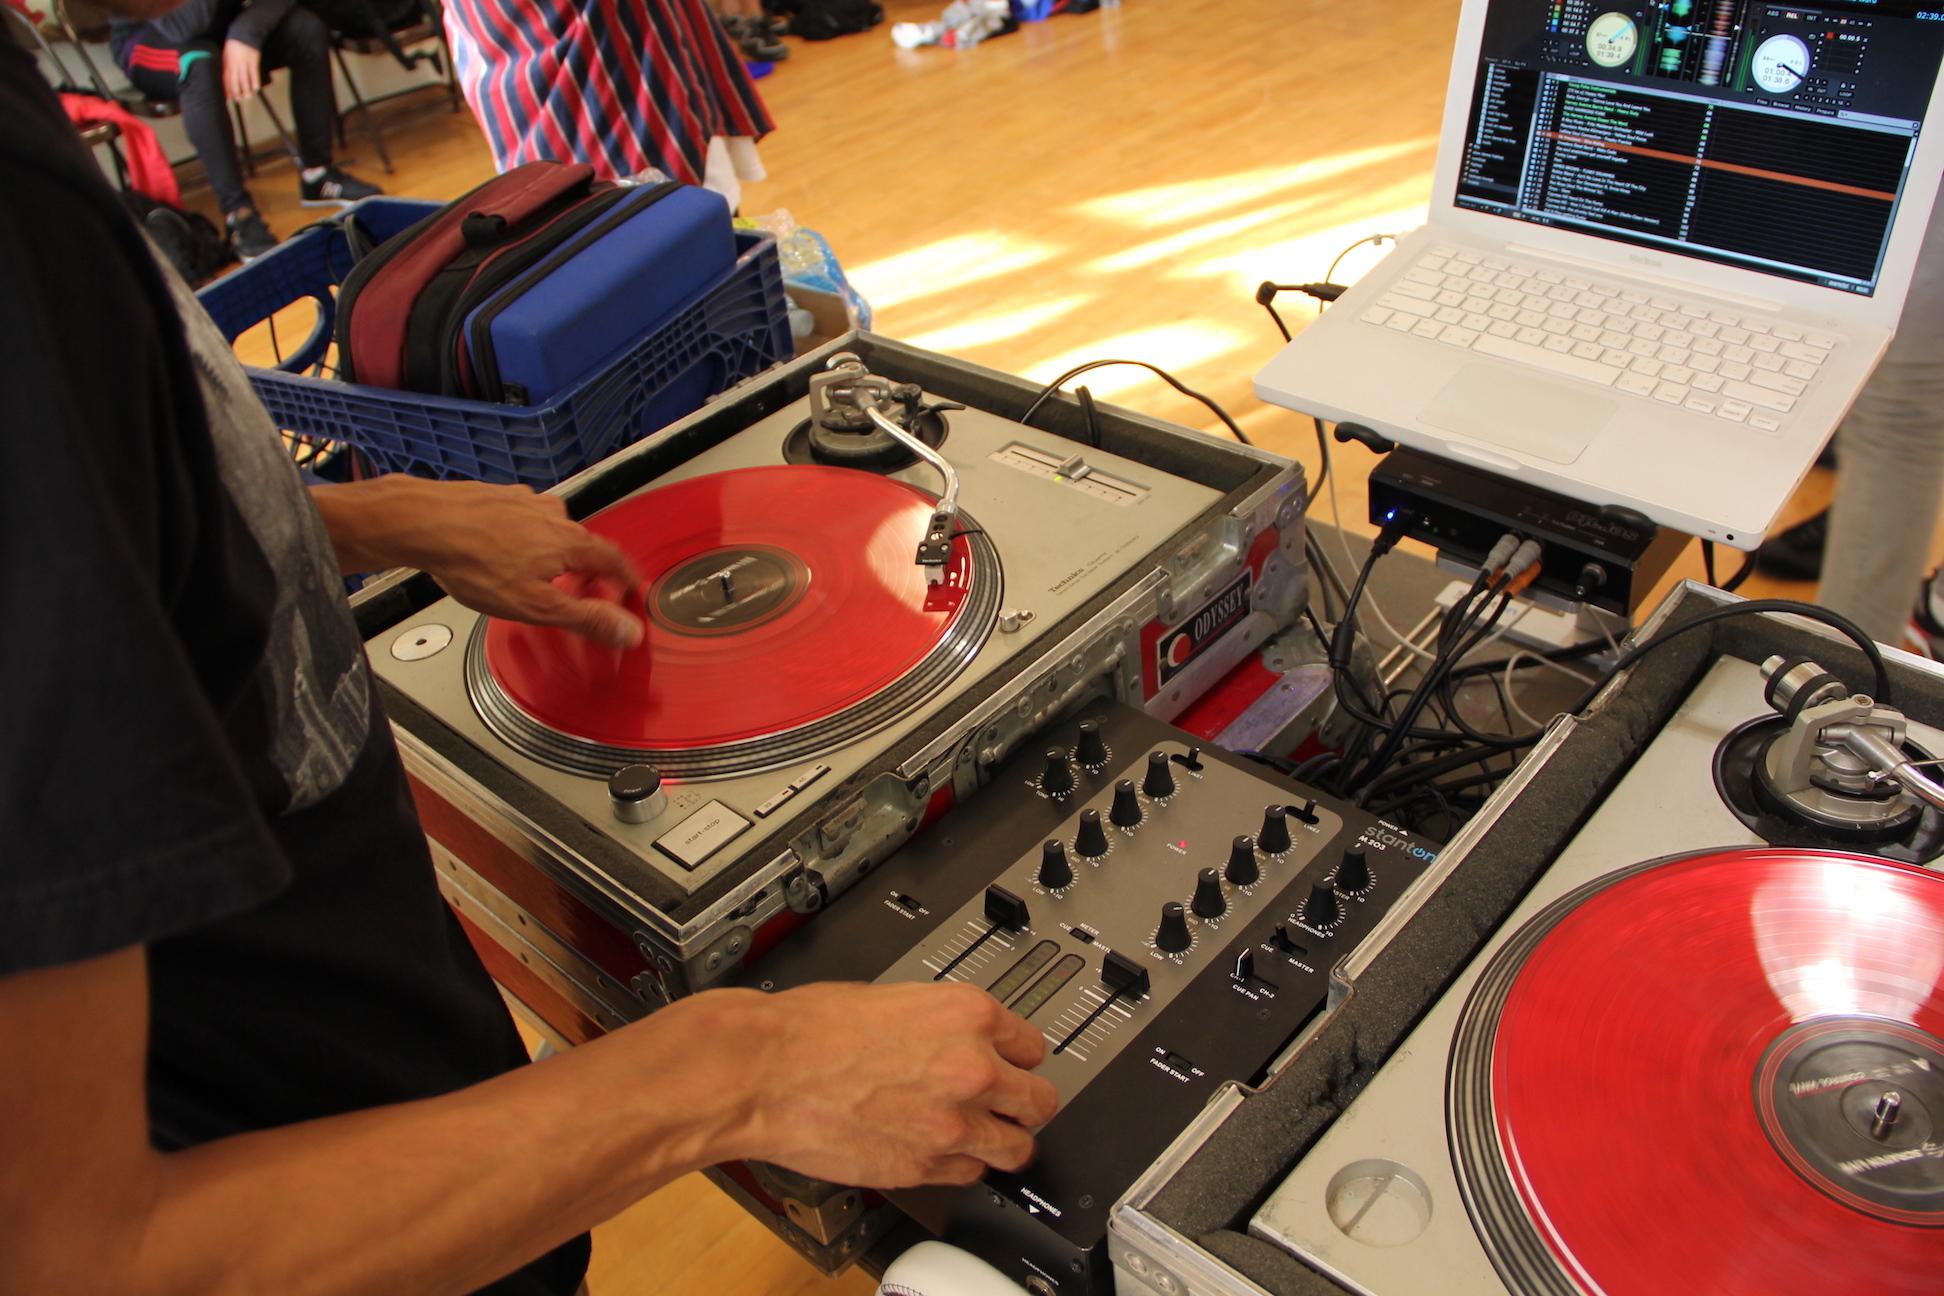 JUiCE Los Angeles Hip Hop Nonprofit Breakdance Music Art Community Turntables Vinyl.JPG